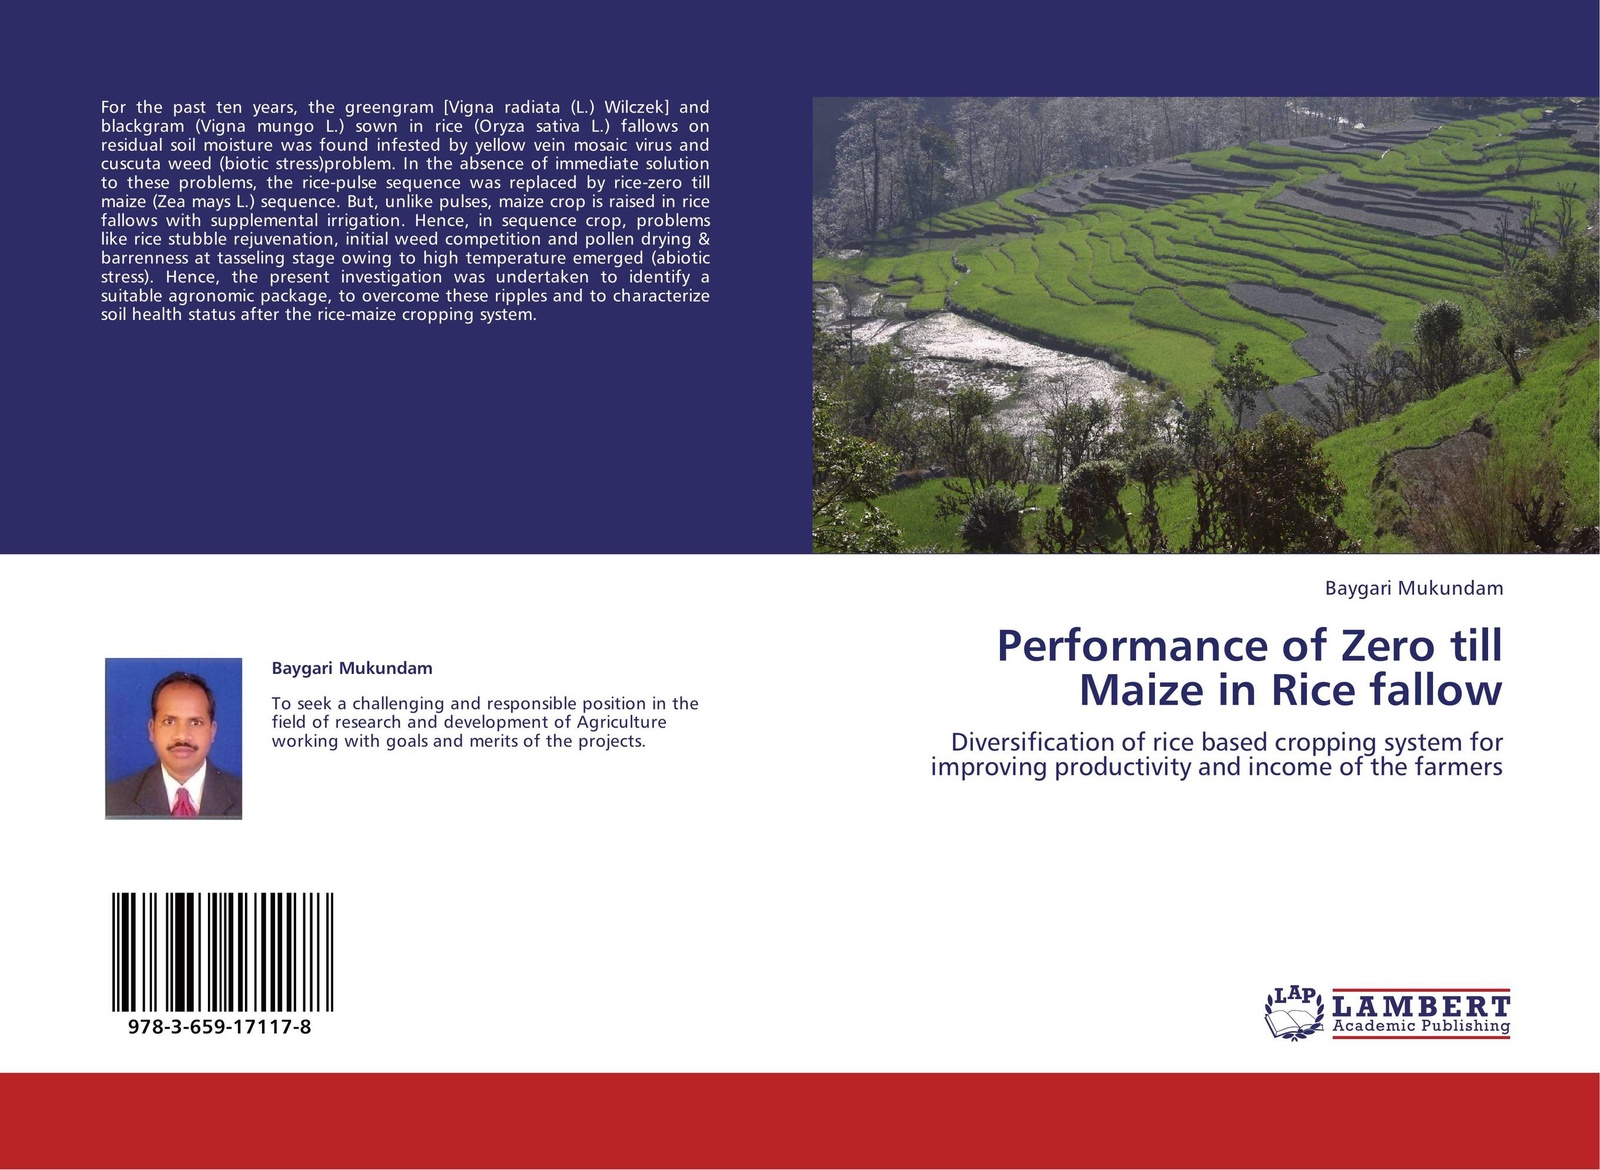 Baygari Mukundam Performance of Zero till Maize in Rice fallow shakuntala meena r k mathukia and v d khanpara weed management in summer greengram vigna radiata l page 3